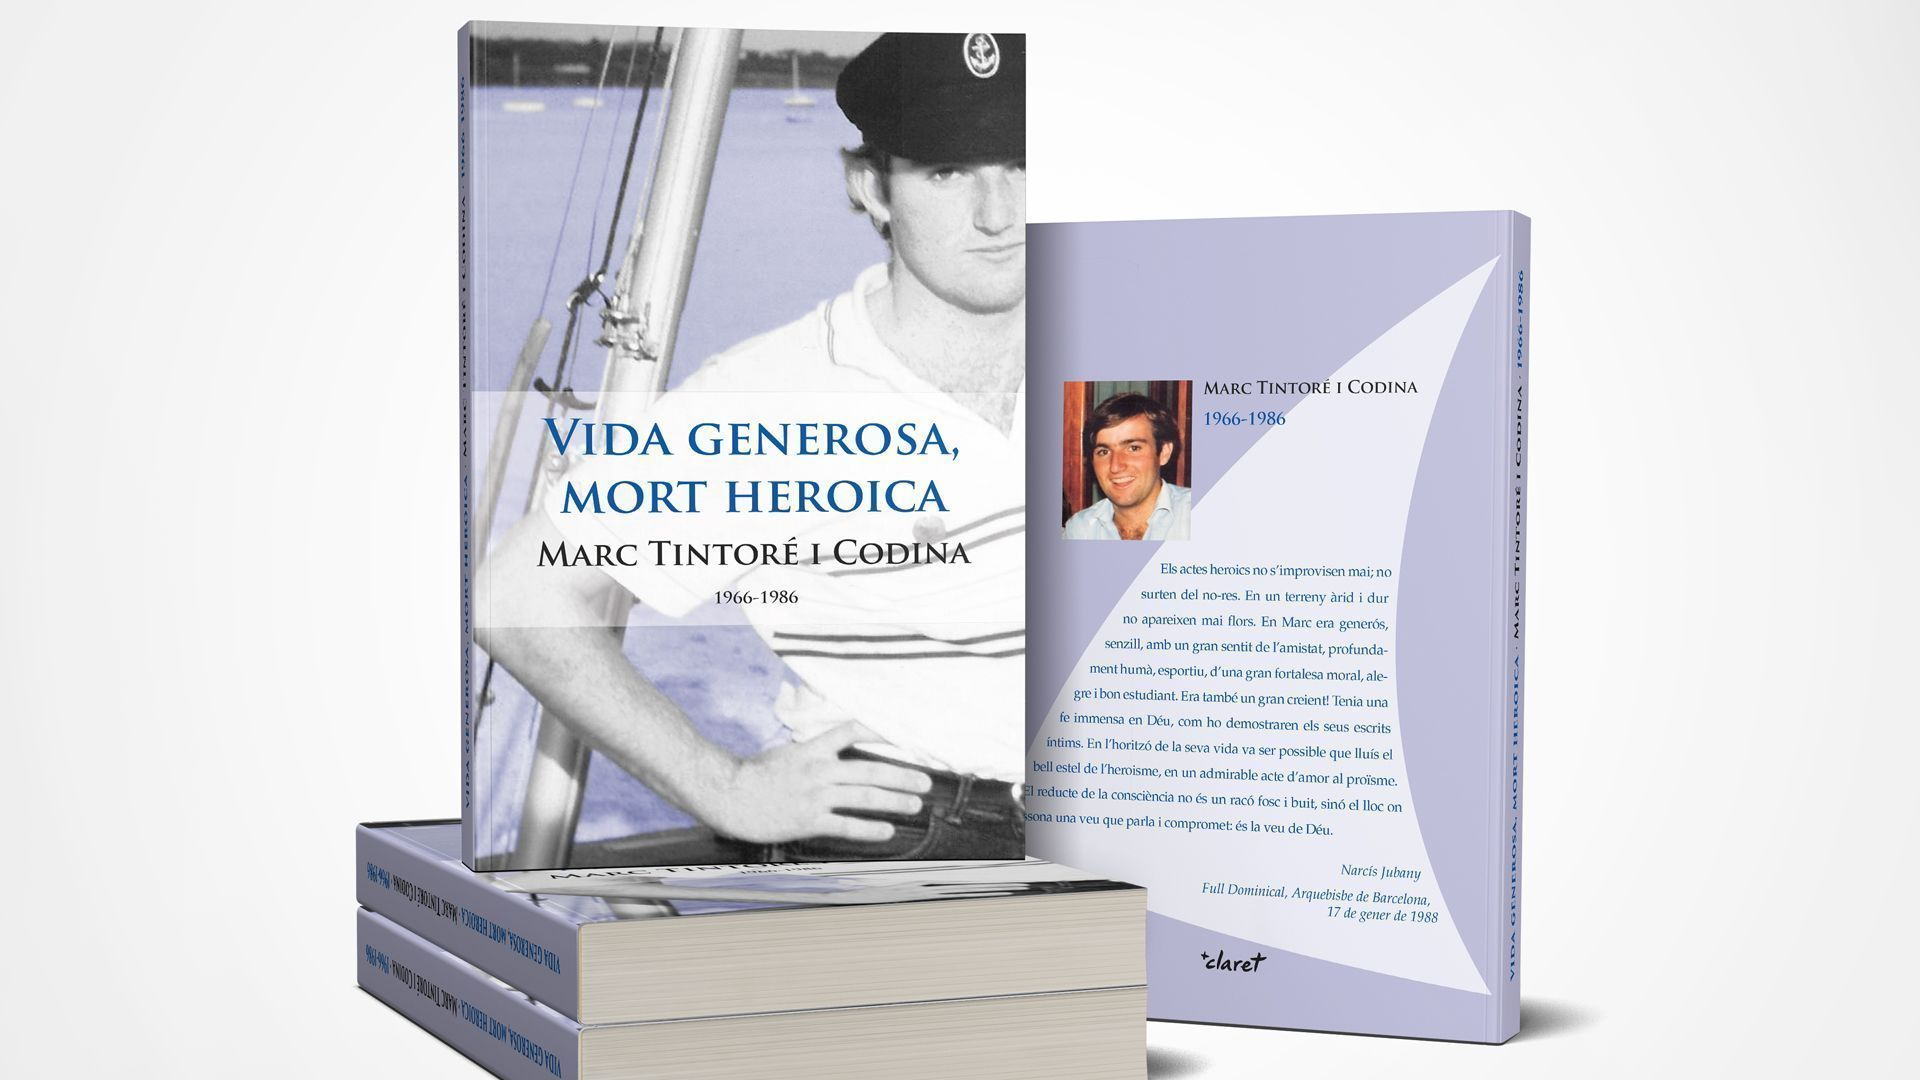 Marc Tintoré, Vida generosa, mort heroica